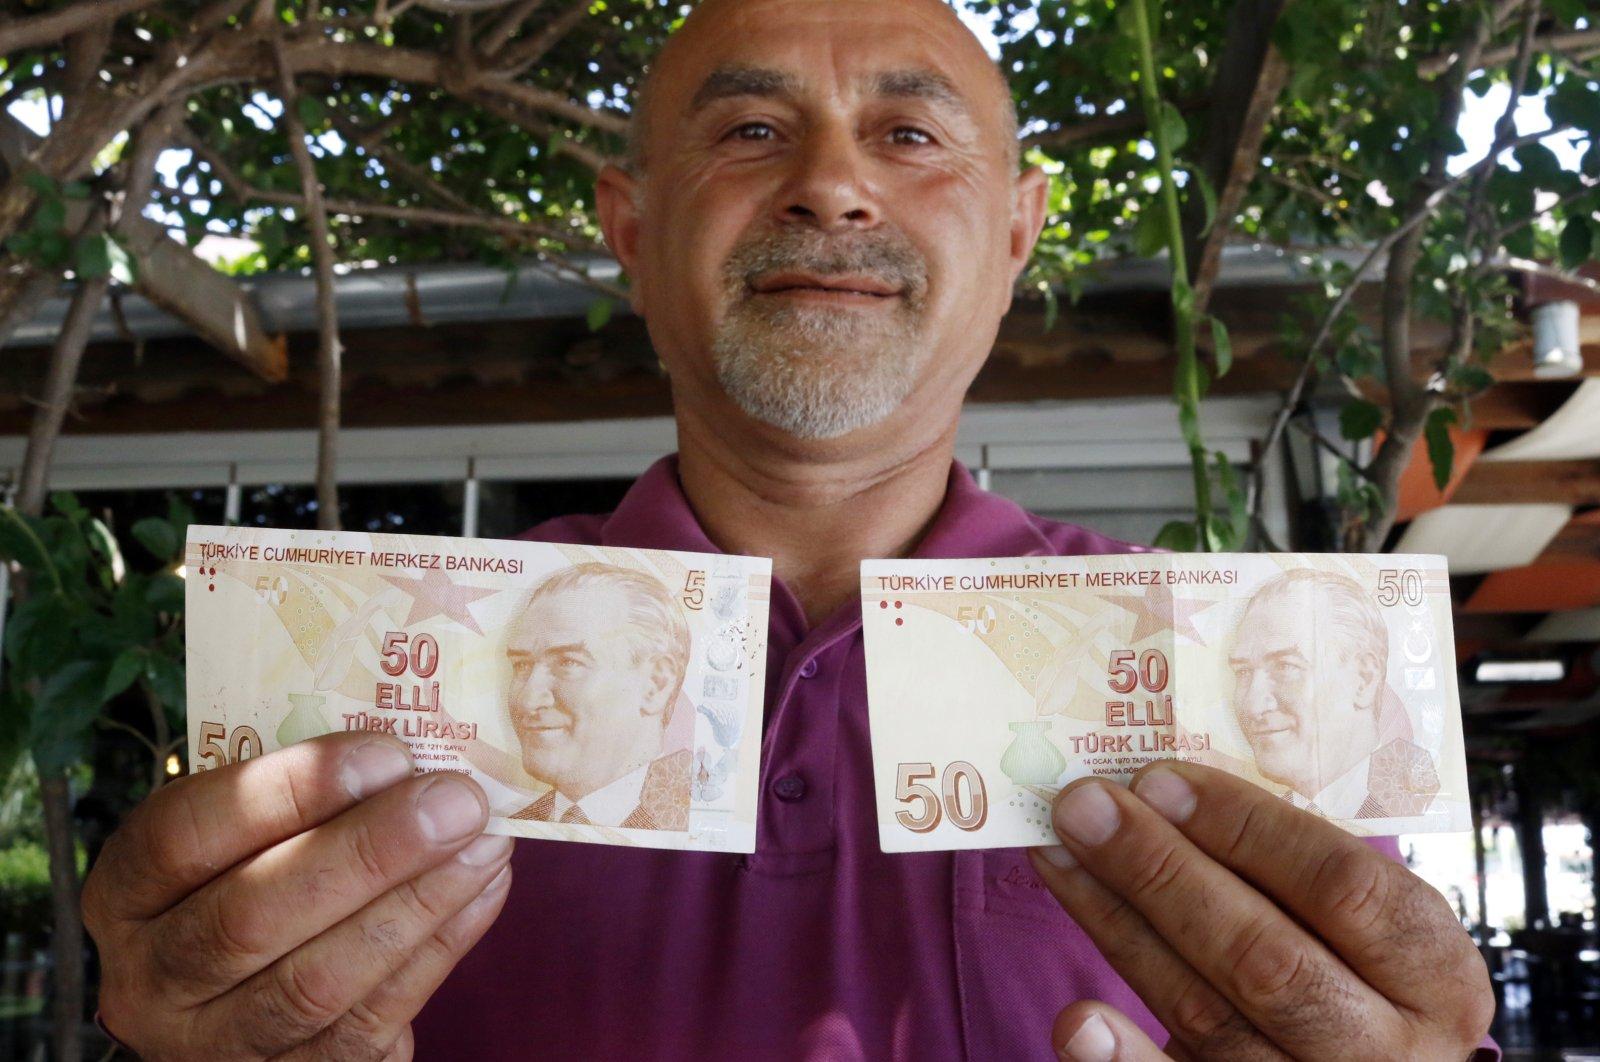 Mustafa Şahin holds up his misprinted TL 50 bill (L) and a normal one, Antalya, Turkey, July 9, 2020. (DHA Photo)